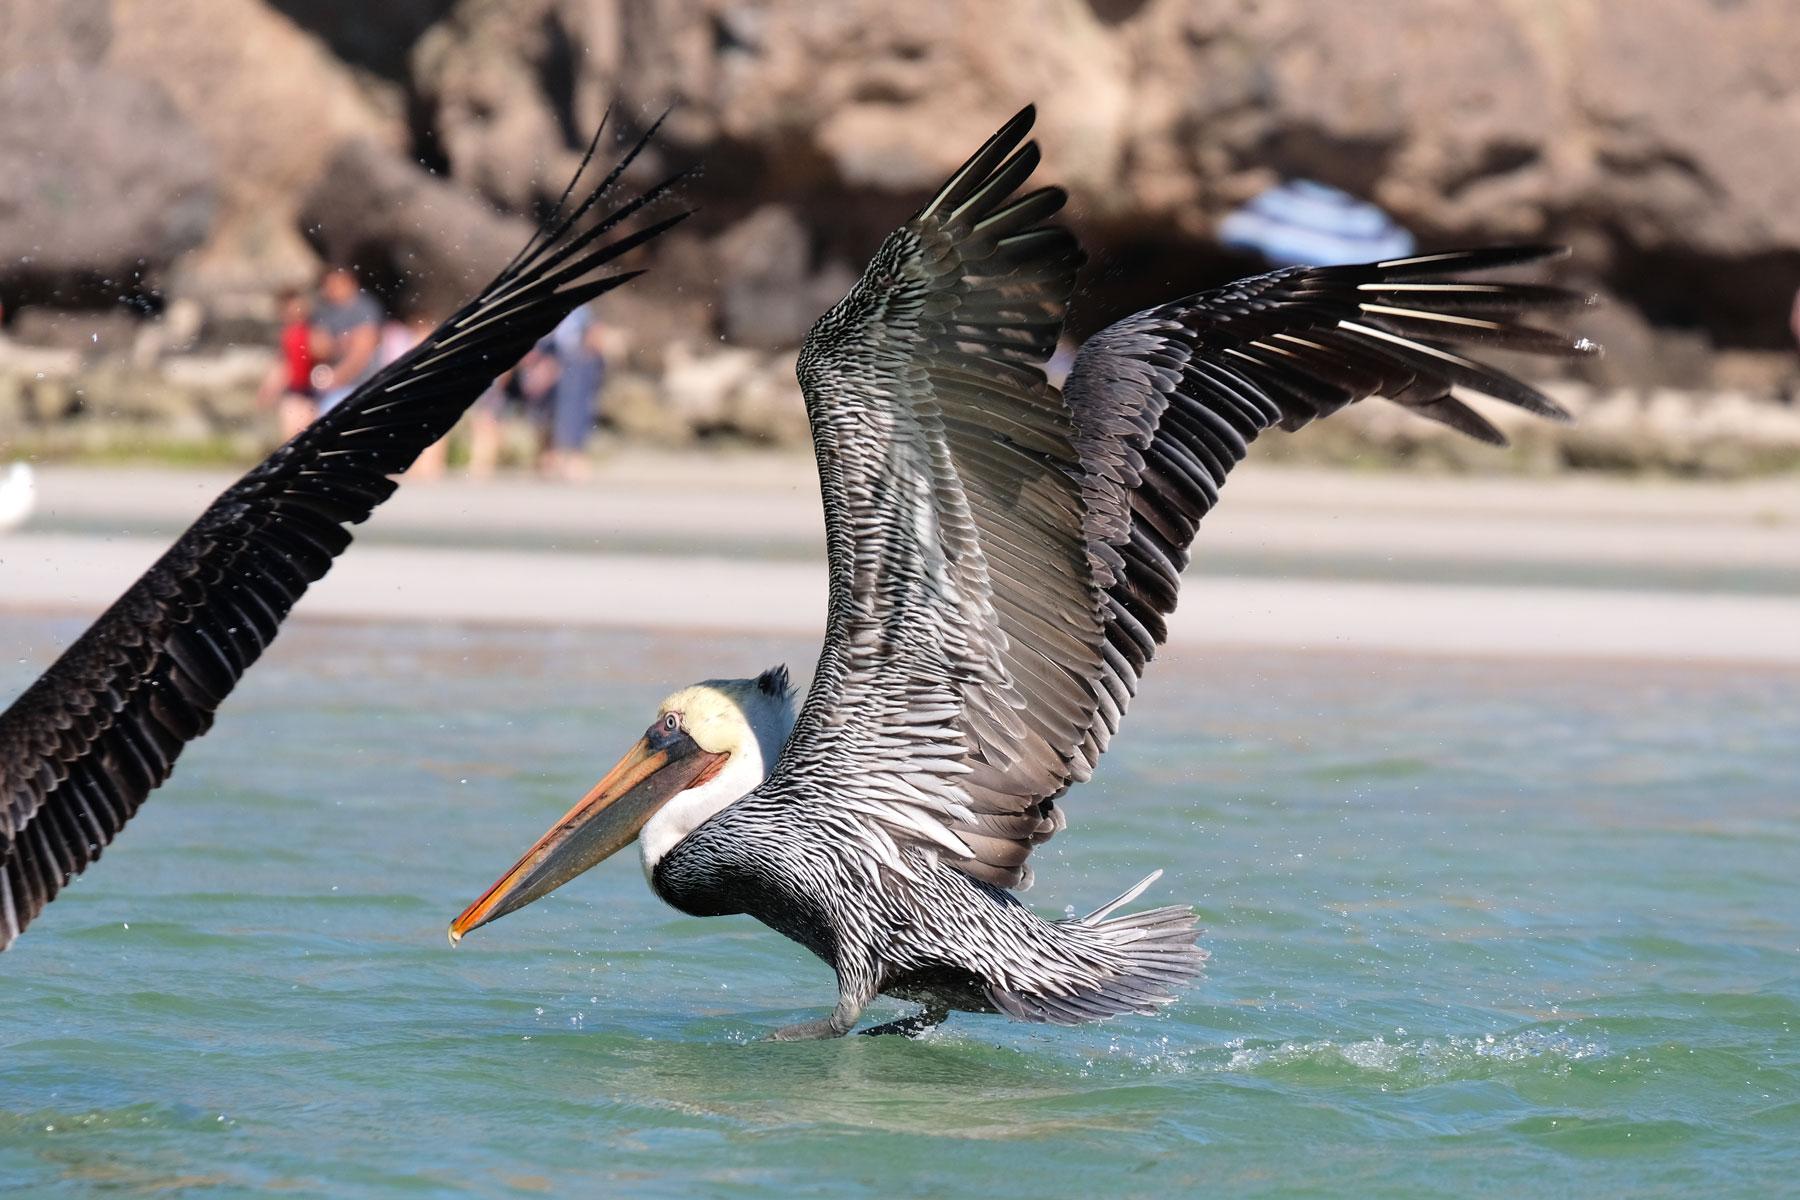 Ein Pelikan landet im Wasser vor dem Balandra Beach in La Paz, Baja California, Mexiko.